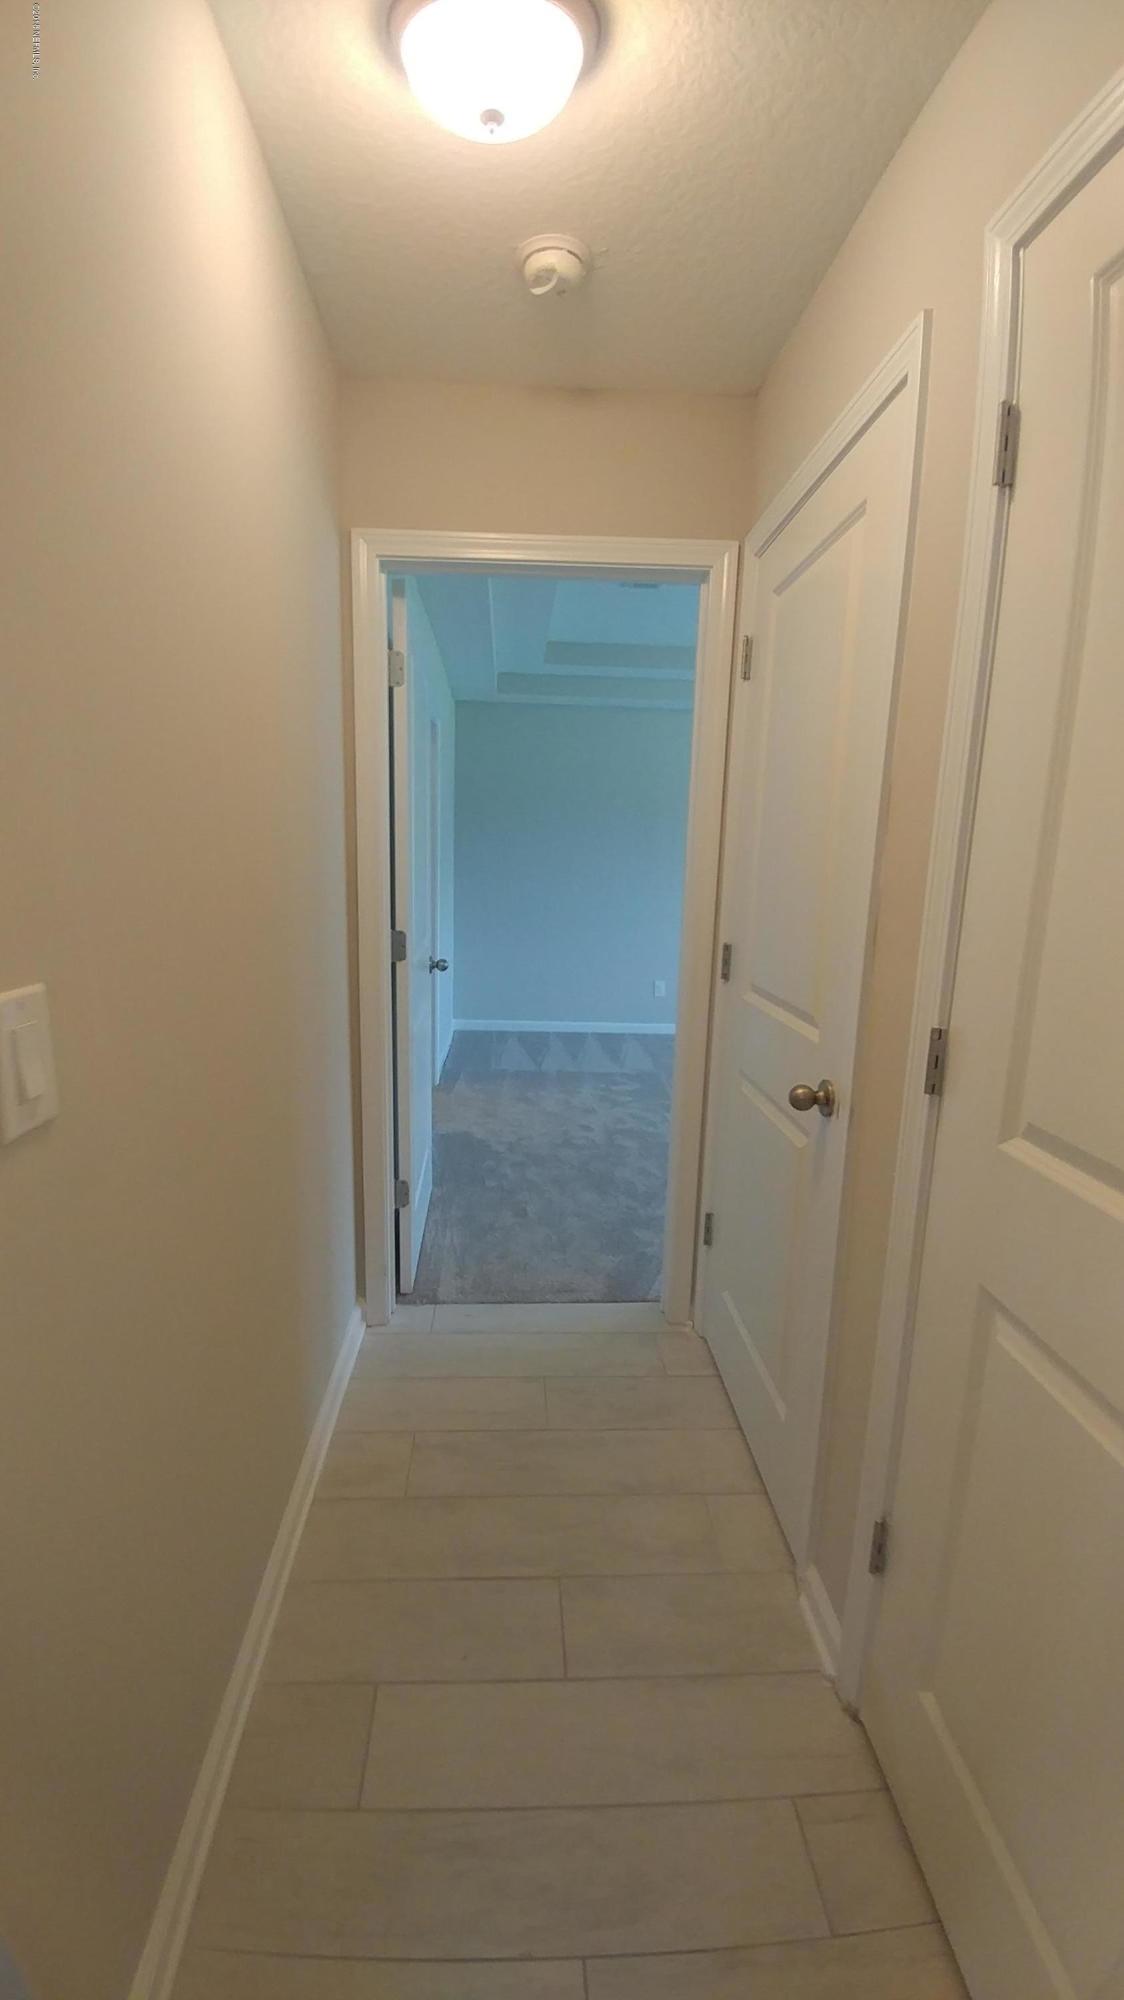 85426 AMARYLLIS, FERNANDINA BEACH, FLORIDA 32034, 4 Bedrooms Bedrooms, ,3 BathroomsBathrooms,Residential - single family,For sale,AMARYLLIS,911384